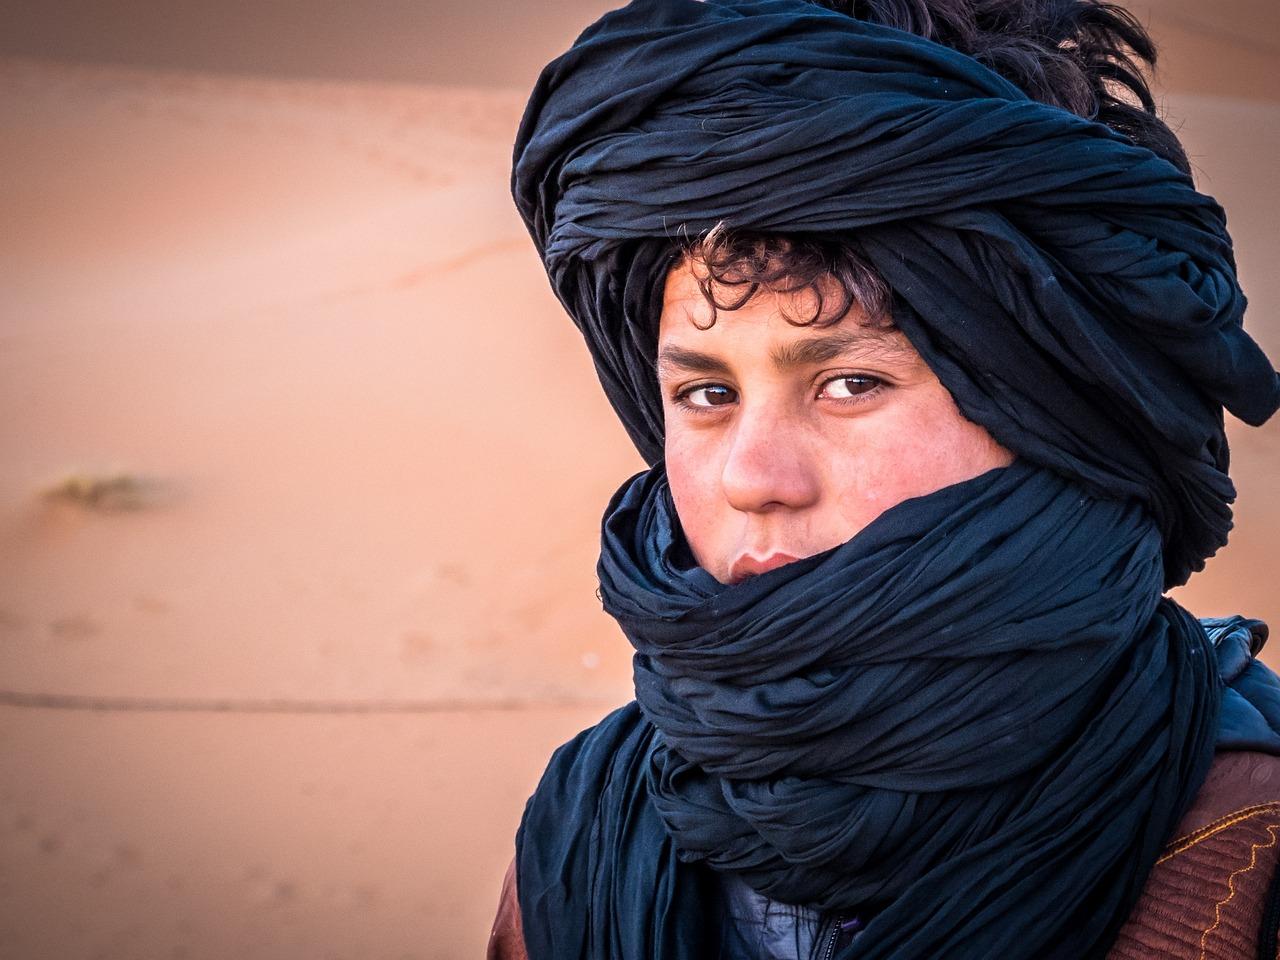 данной статье марокканцы фото мужчин нас порно